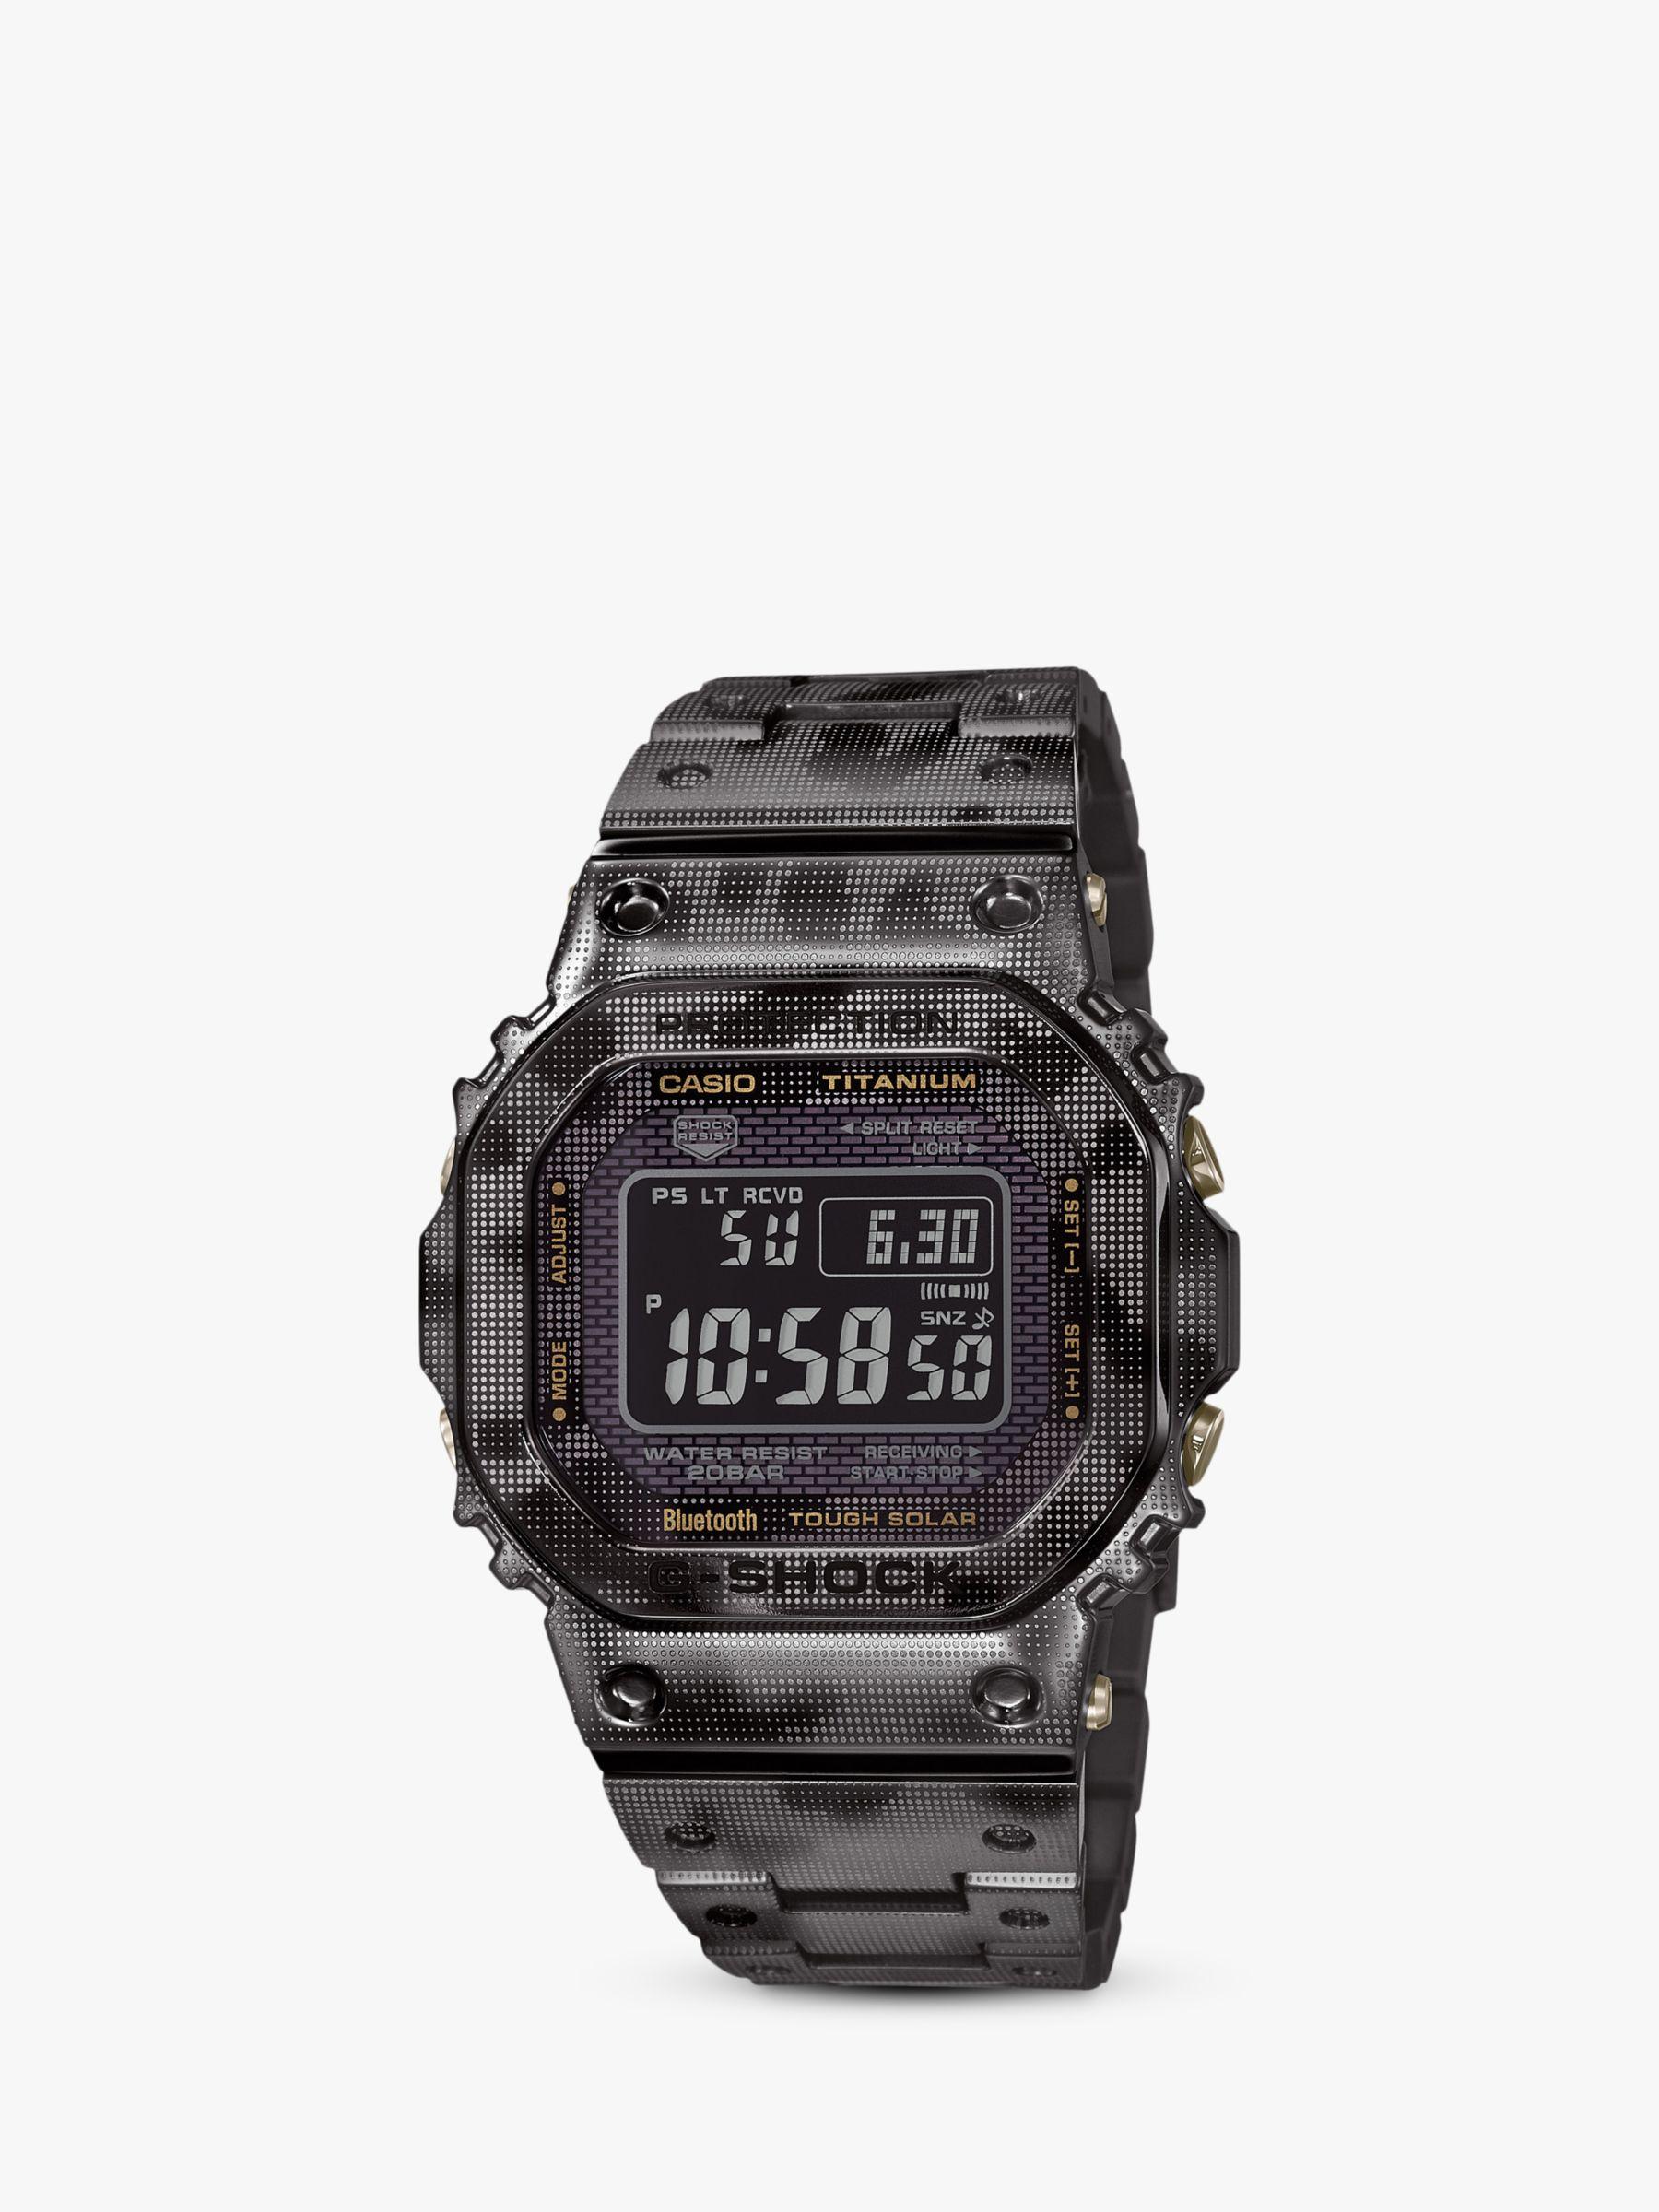 Casio Casio GMW-B5000TCM-1ER Men's G-Shock Titanium Bracelet Strap Watch, Camouflage Grey/Black